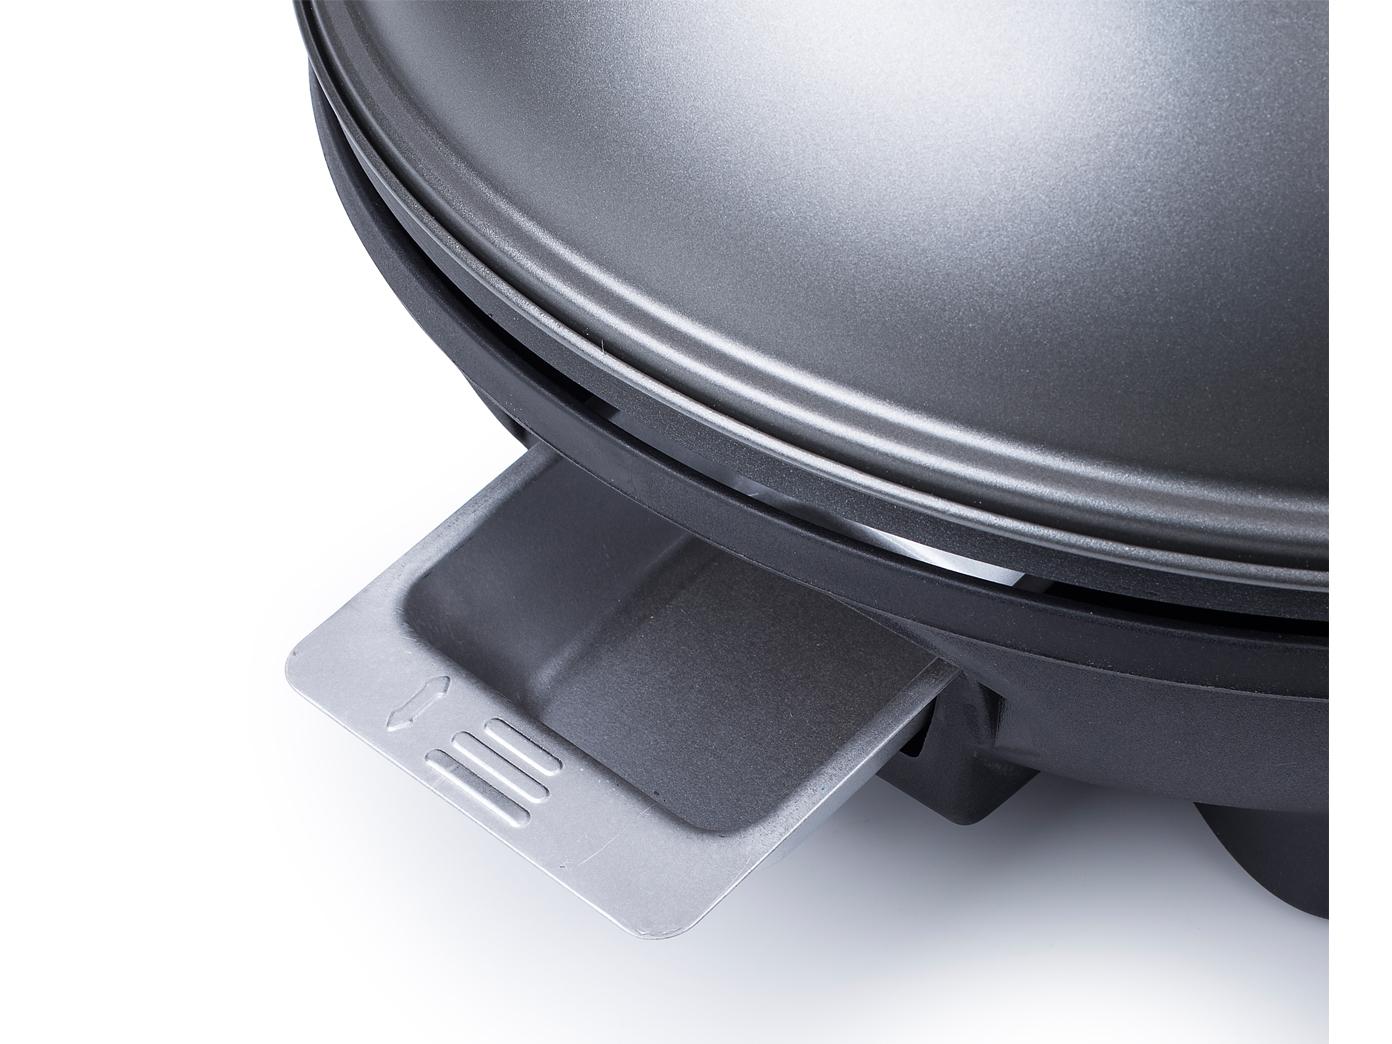 balkongrill elektro kugelgrill grill ohne rauch indoor tischgrill standgrill ebay. Black Bedroom Furniture Sets. Home Design Ideas